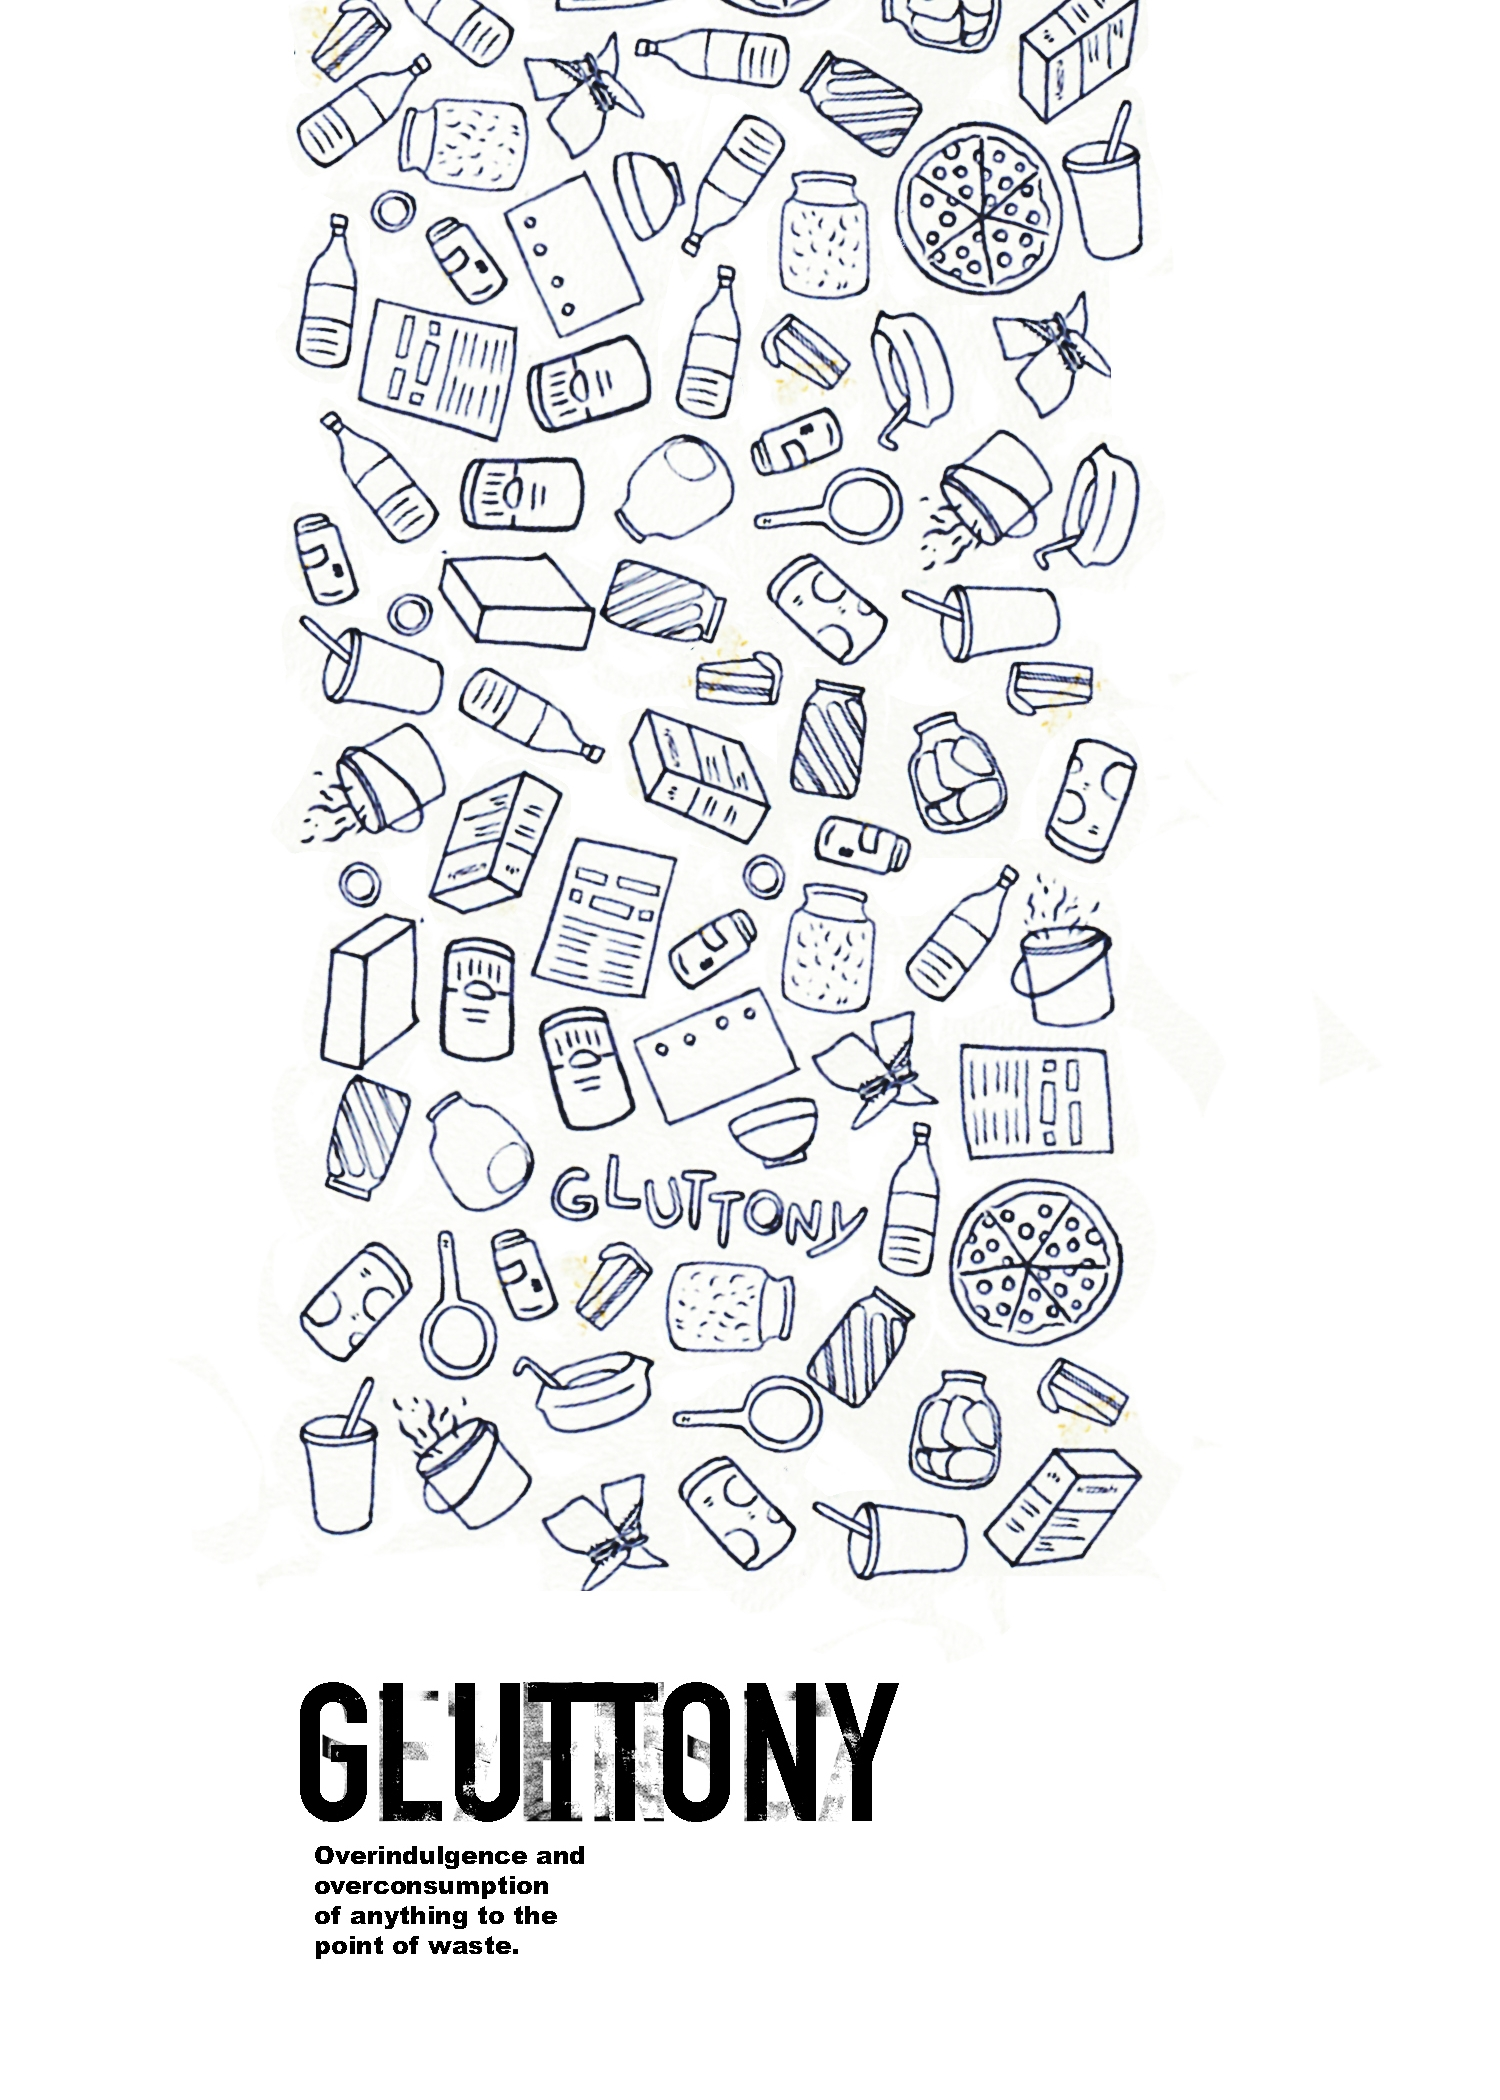 thesis-se7en-postcard gluttony.jpg